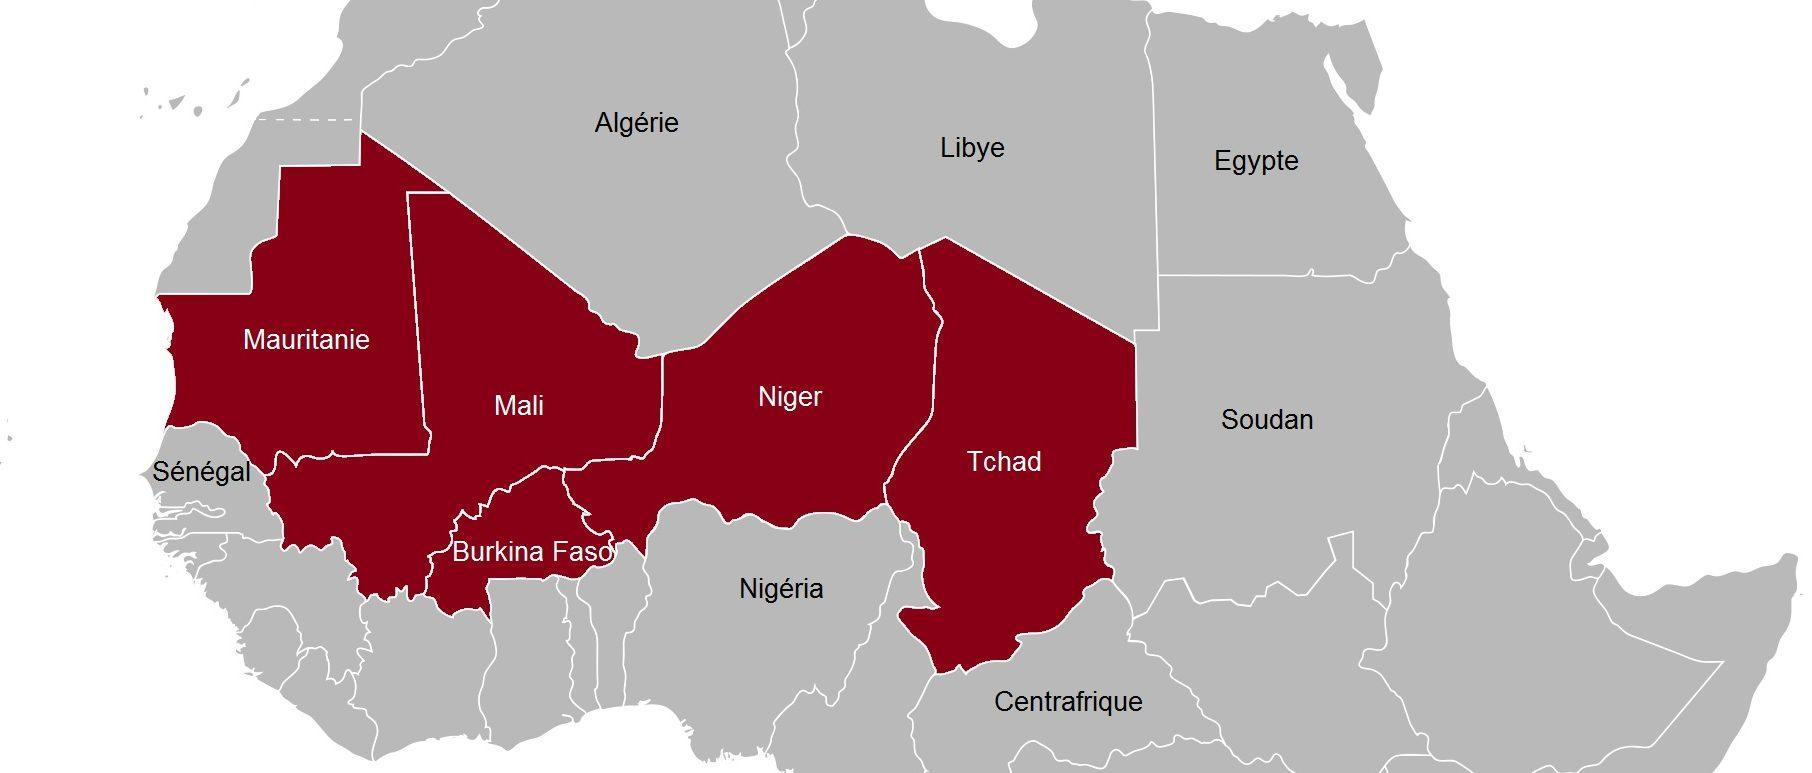 G5_du_Sahel_issu_de_2000px-BlankMap-Africa-1-e1582892020335